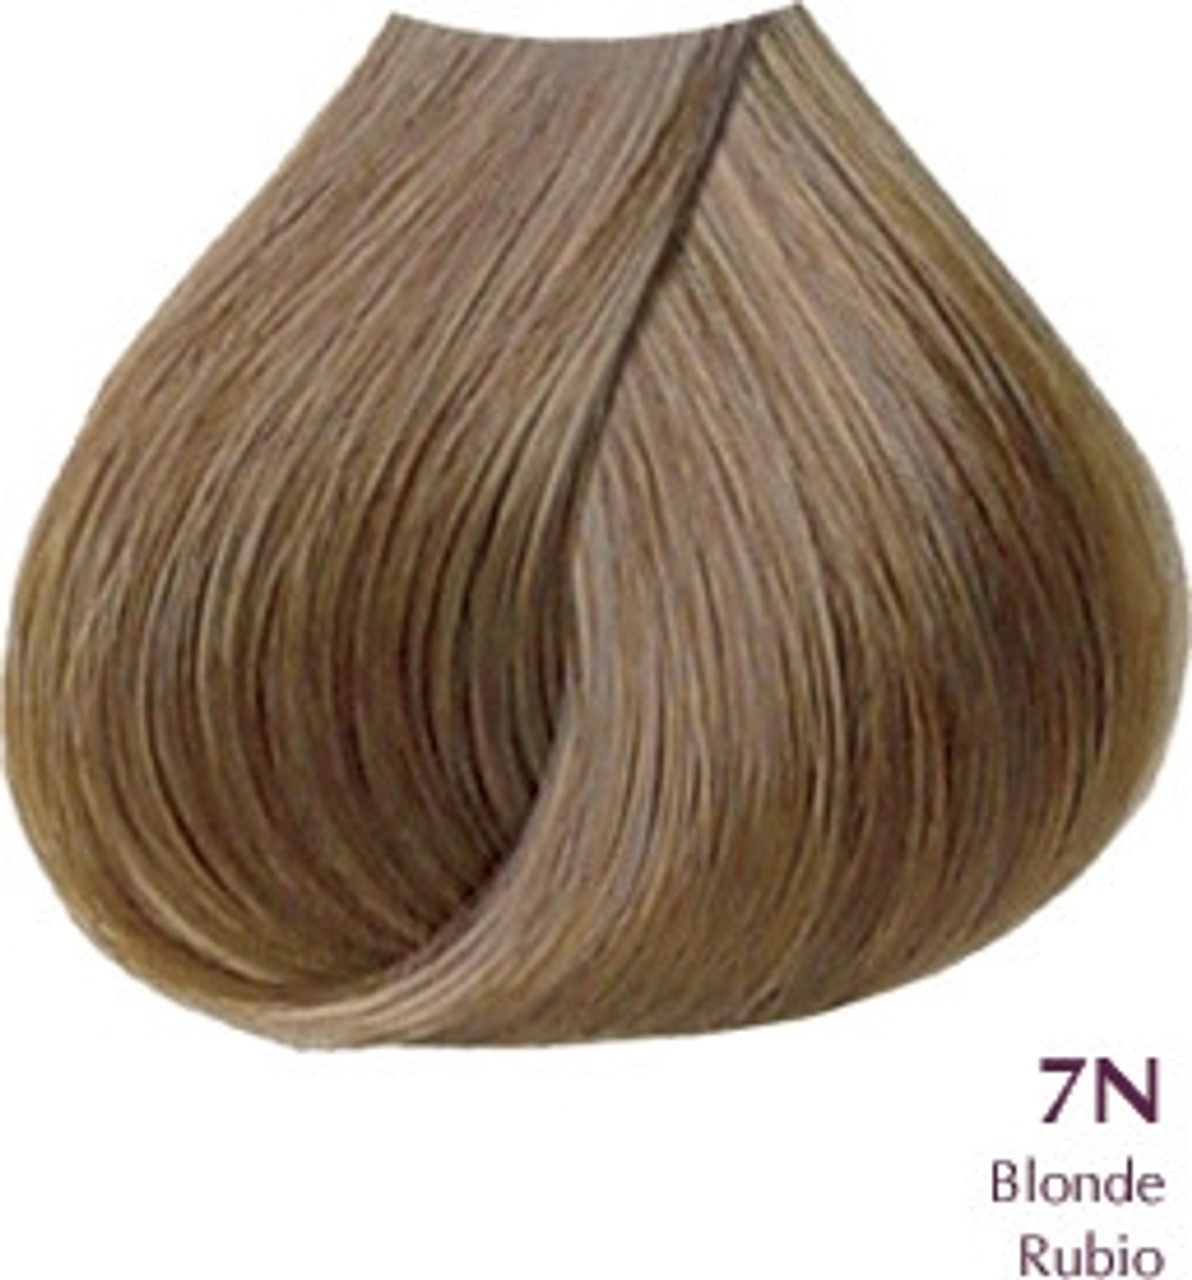 Satin Hair Color - Naturals - 7N Blonde